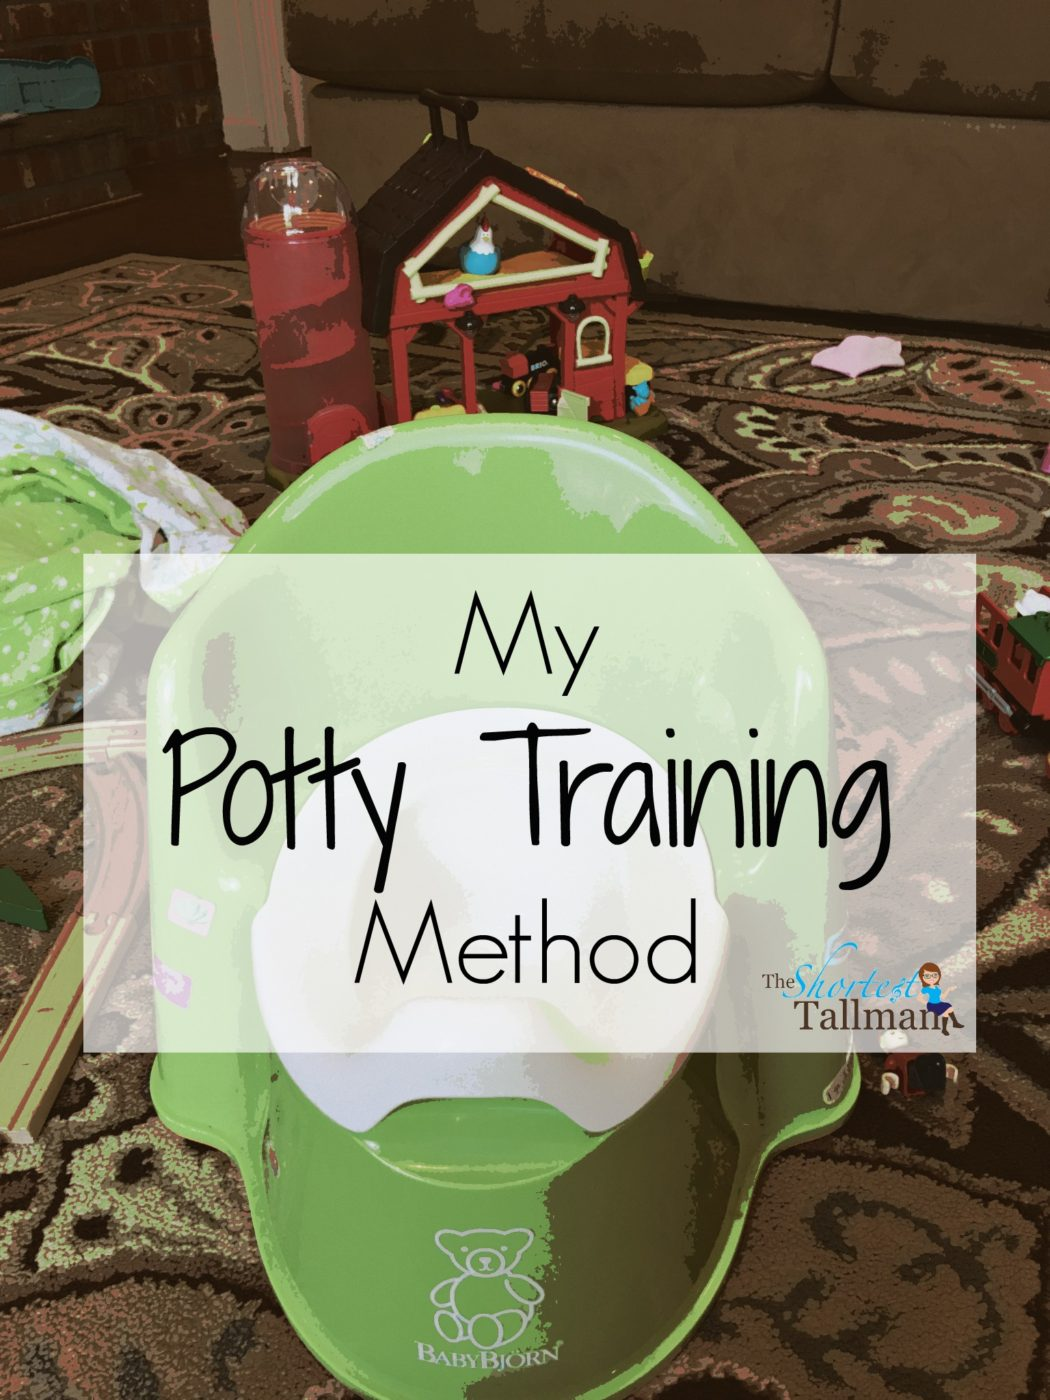 Easy Potty Training! www.theshortesttallman.com